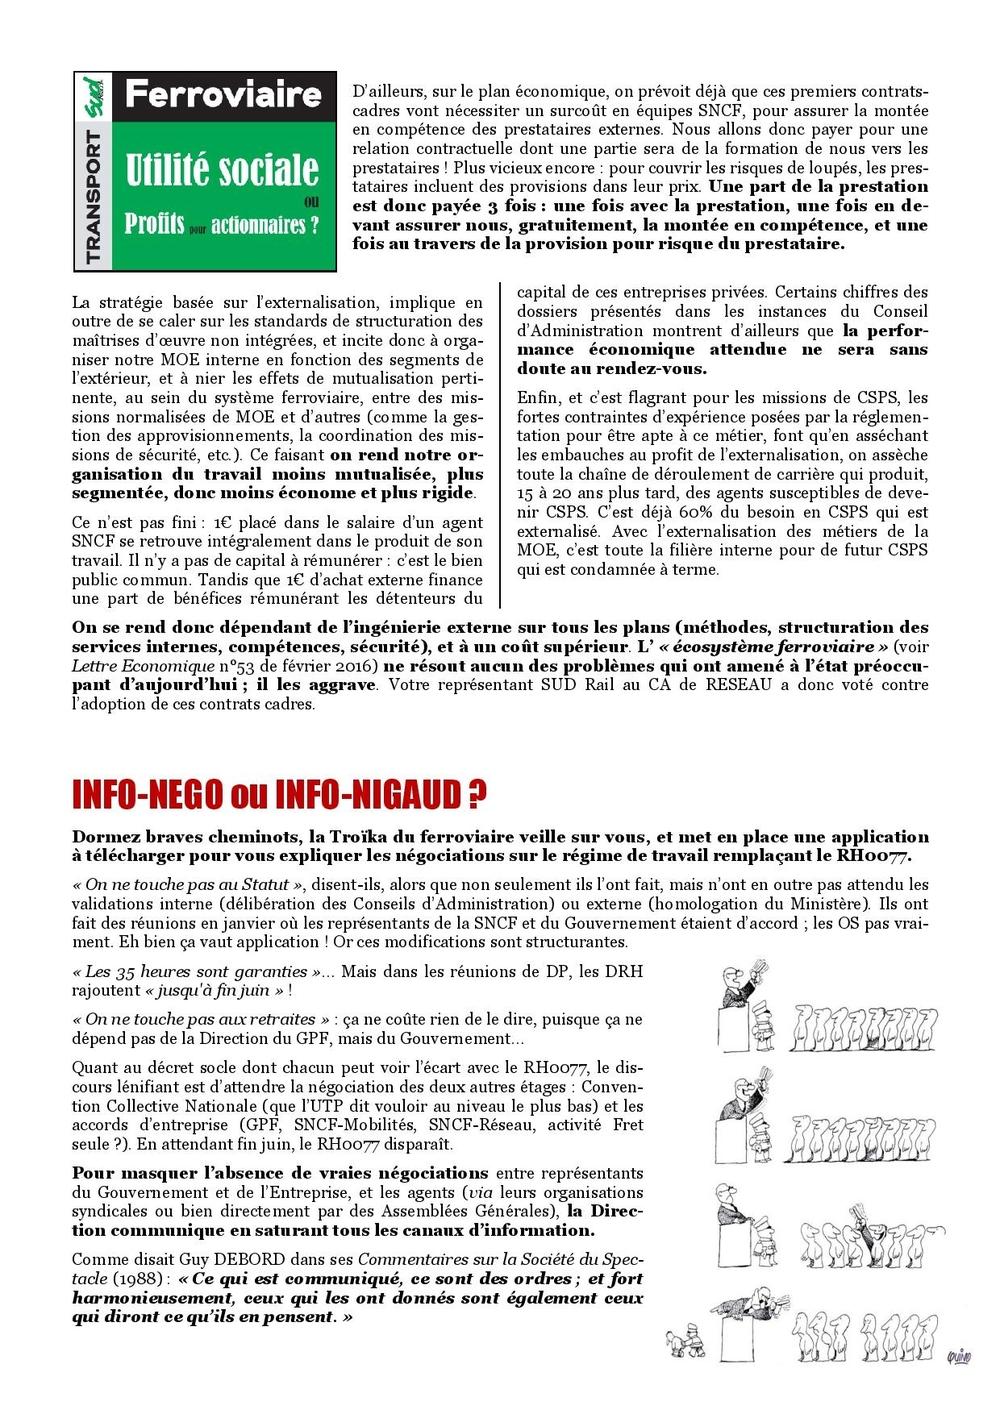 LETTRE ECO 54-2016 03 29-page-002